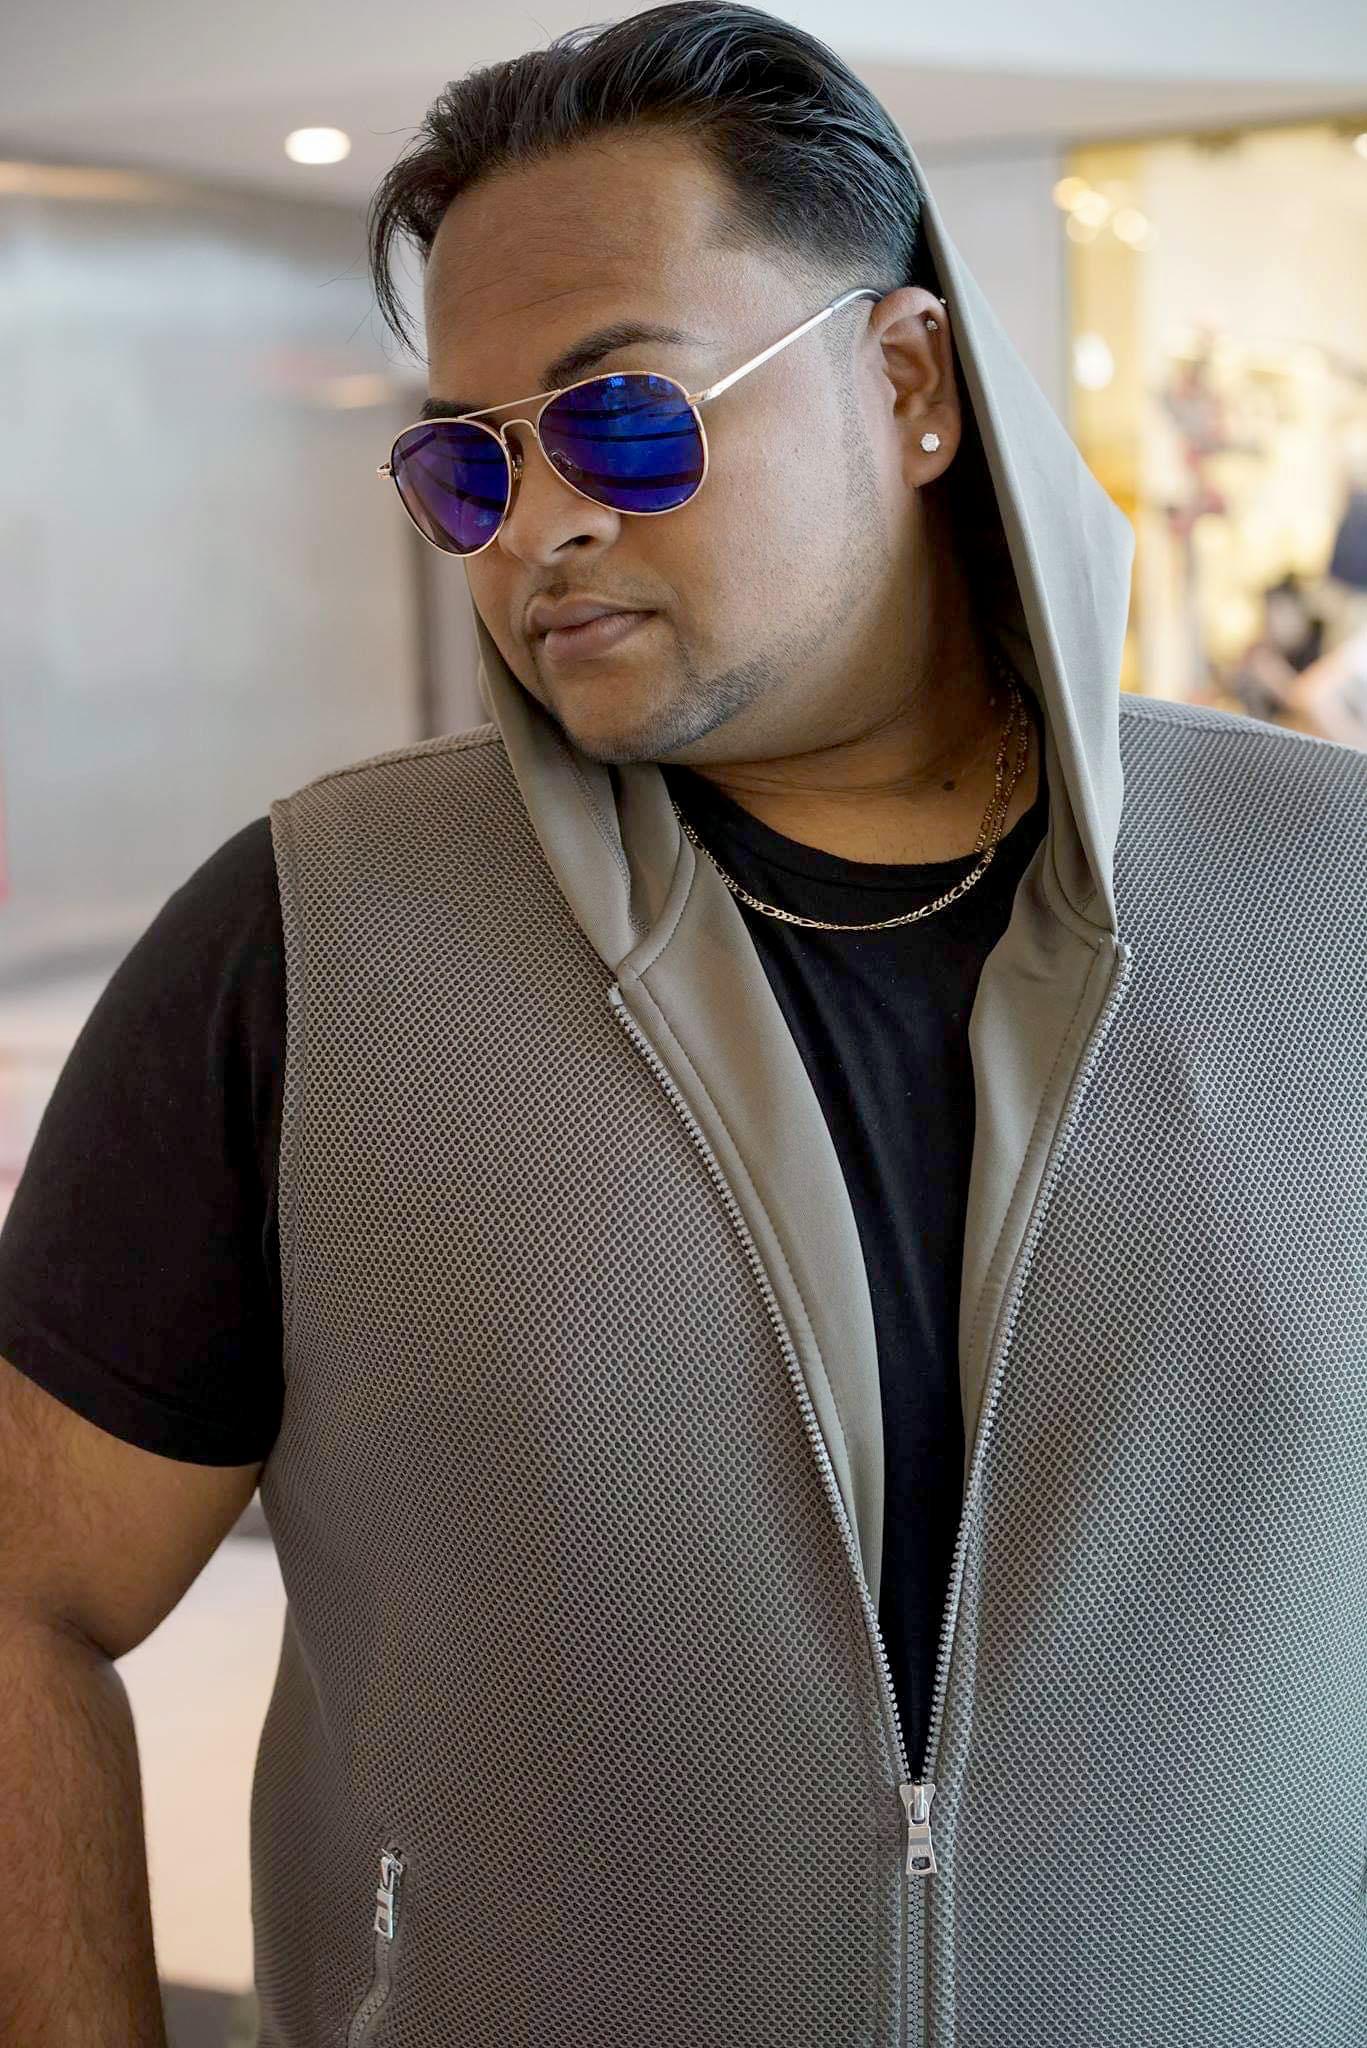 Raj Persaud